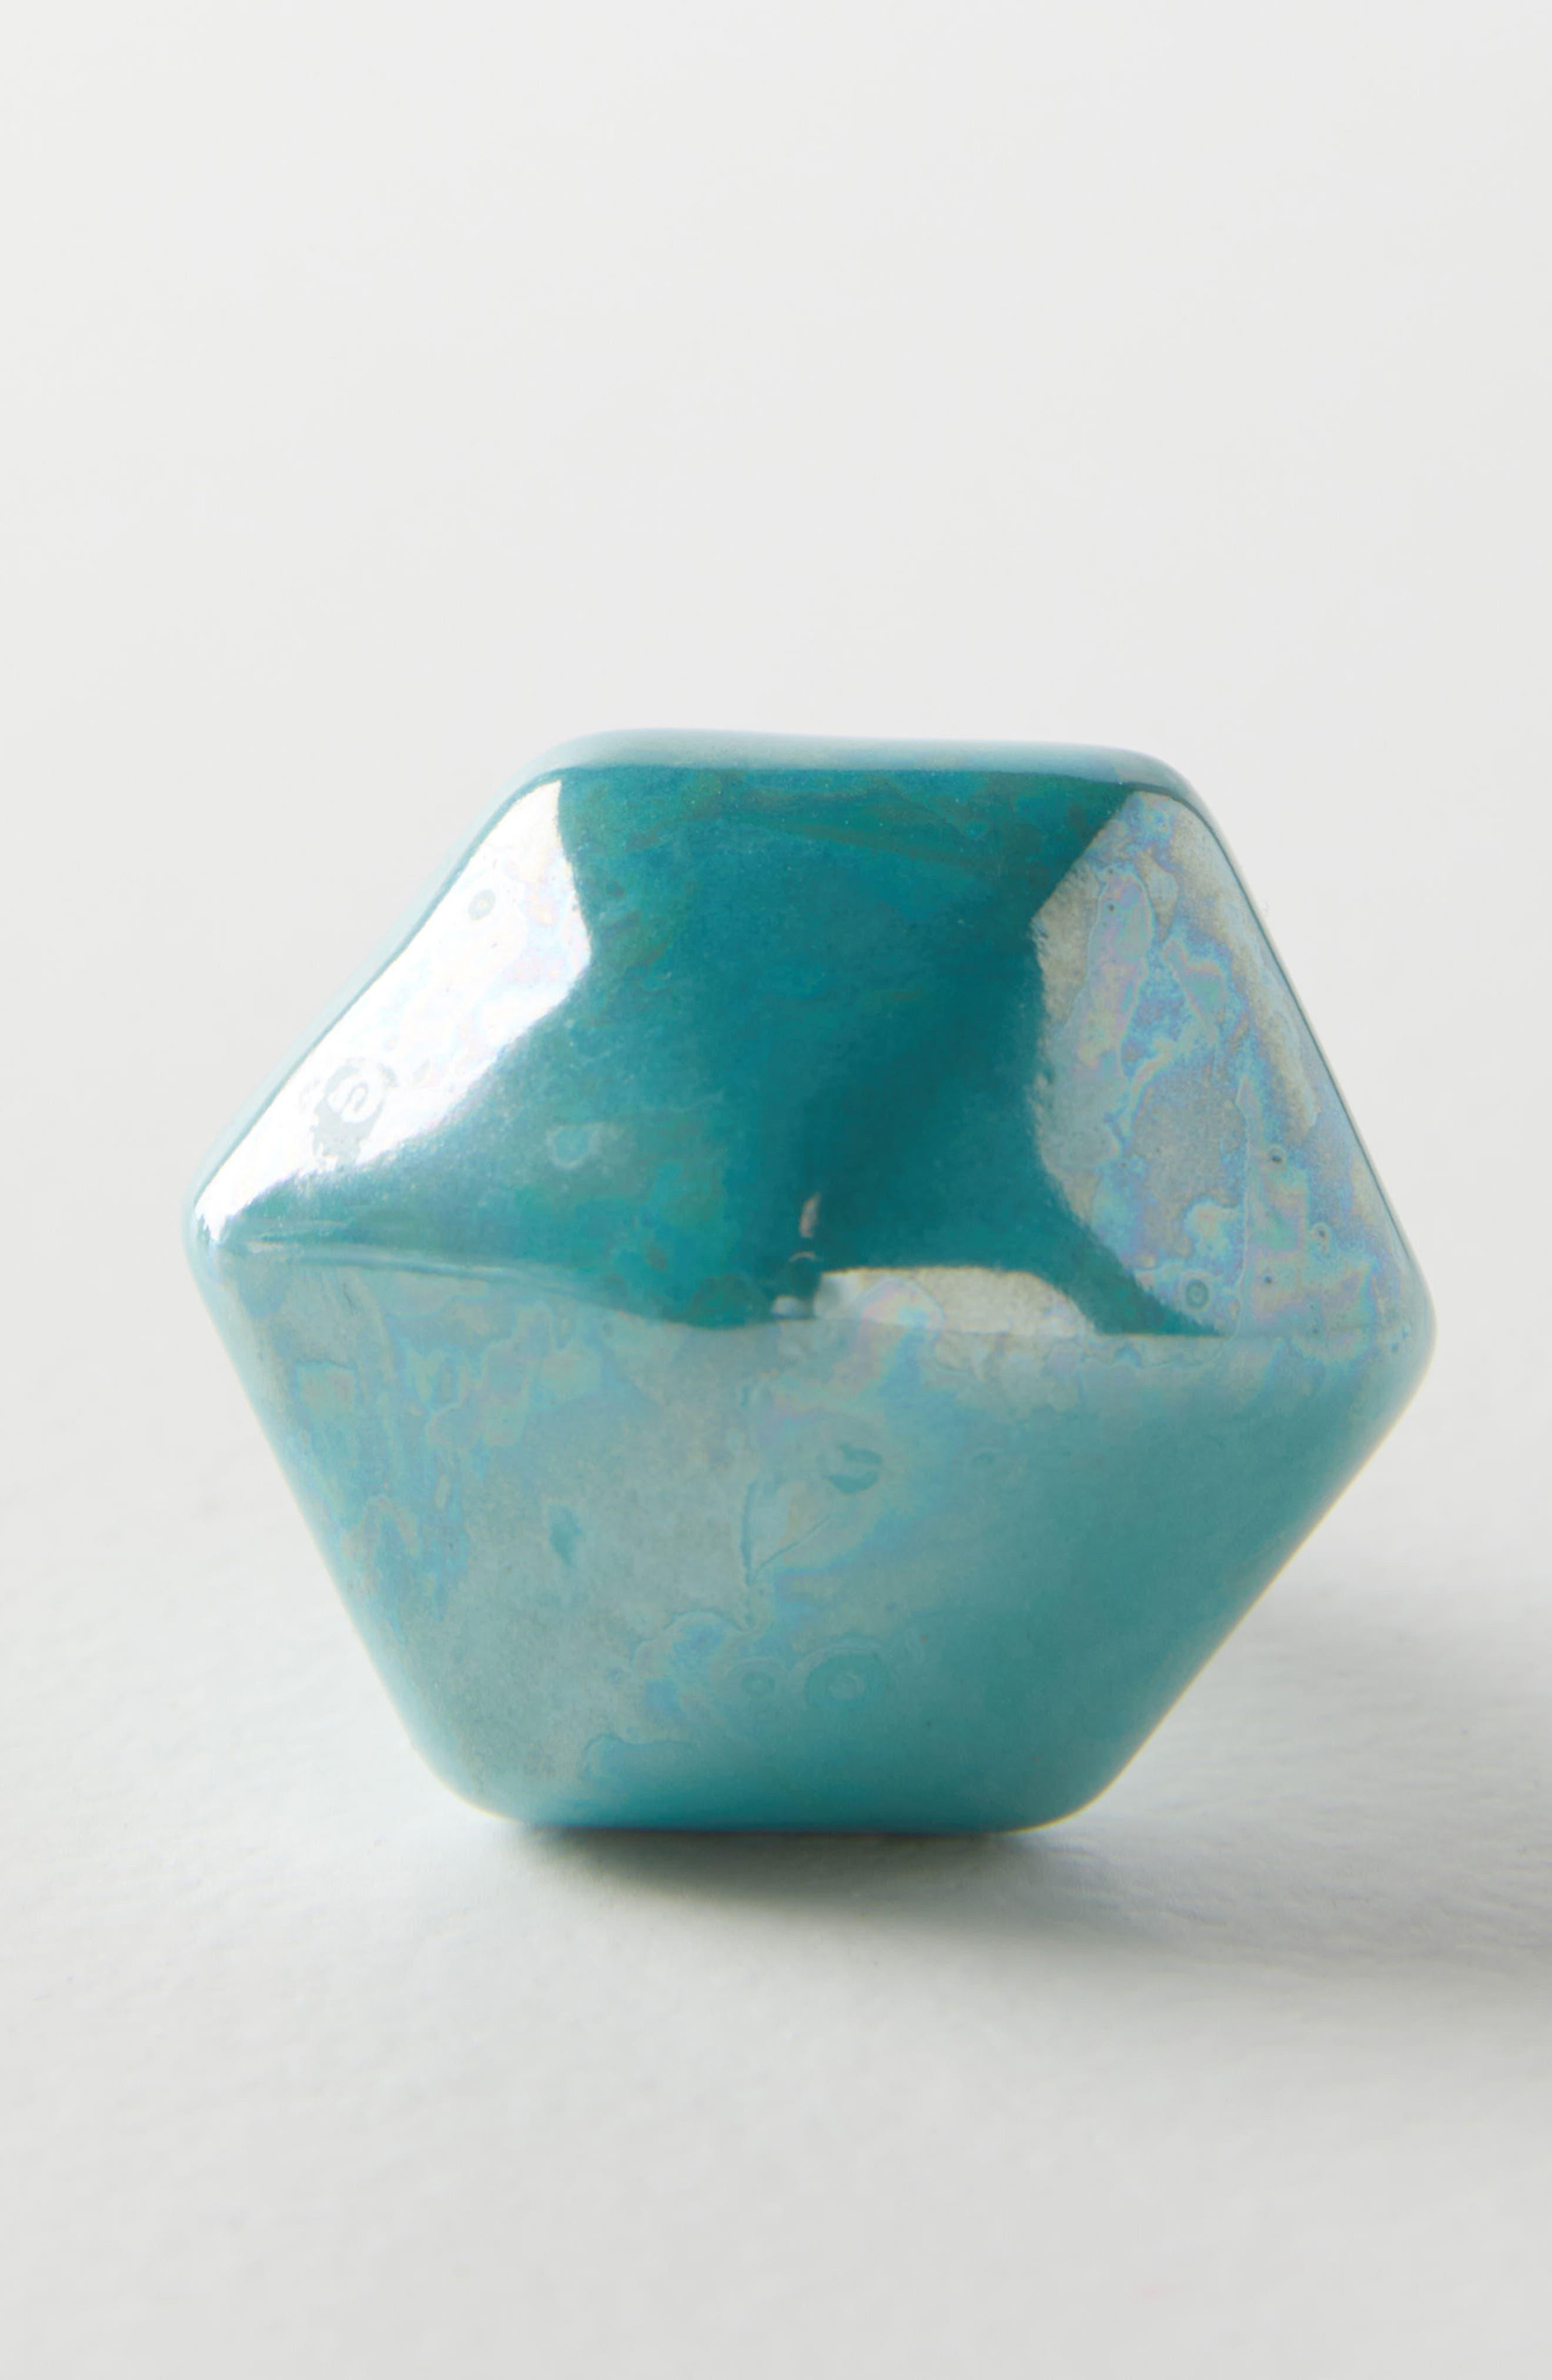 Luna Ceramic Knob,                             Alternate thumbnail 3, color,                             Turquoise